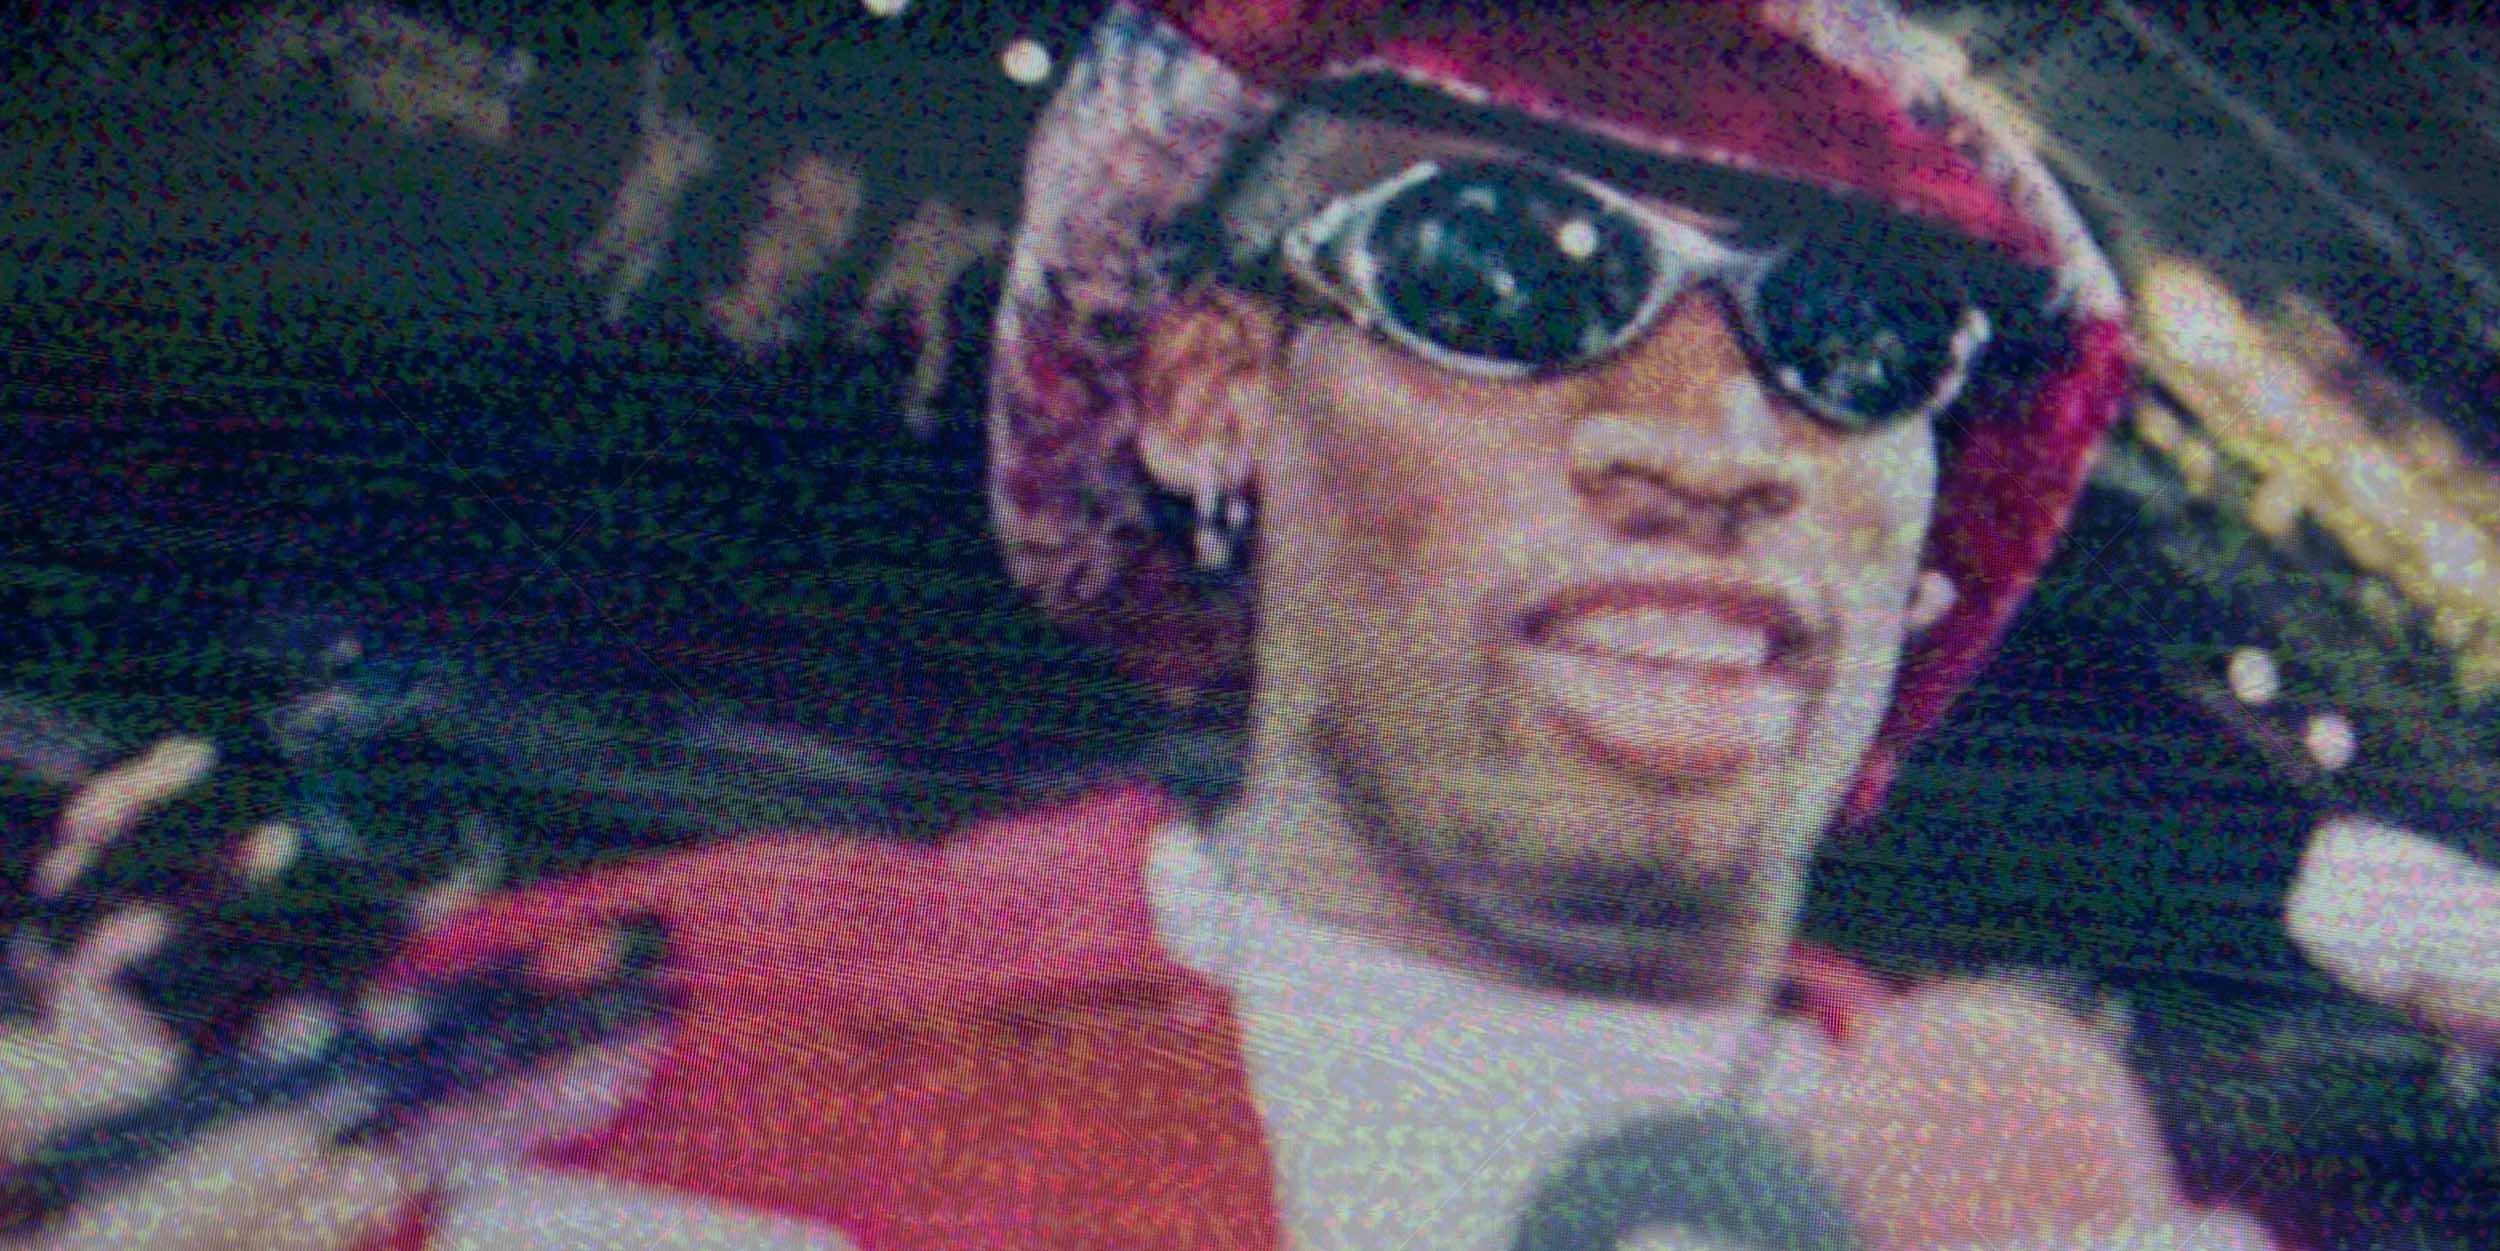 Dennis Rodman was Black boy joy before it was acceptable